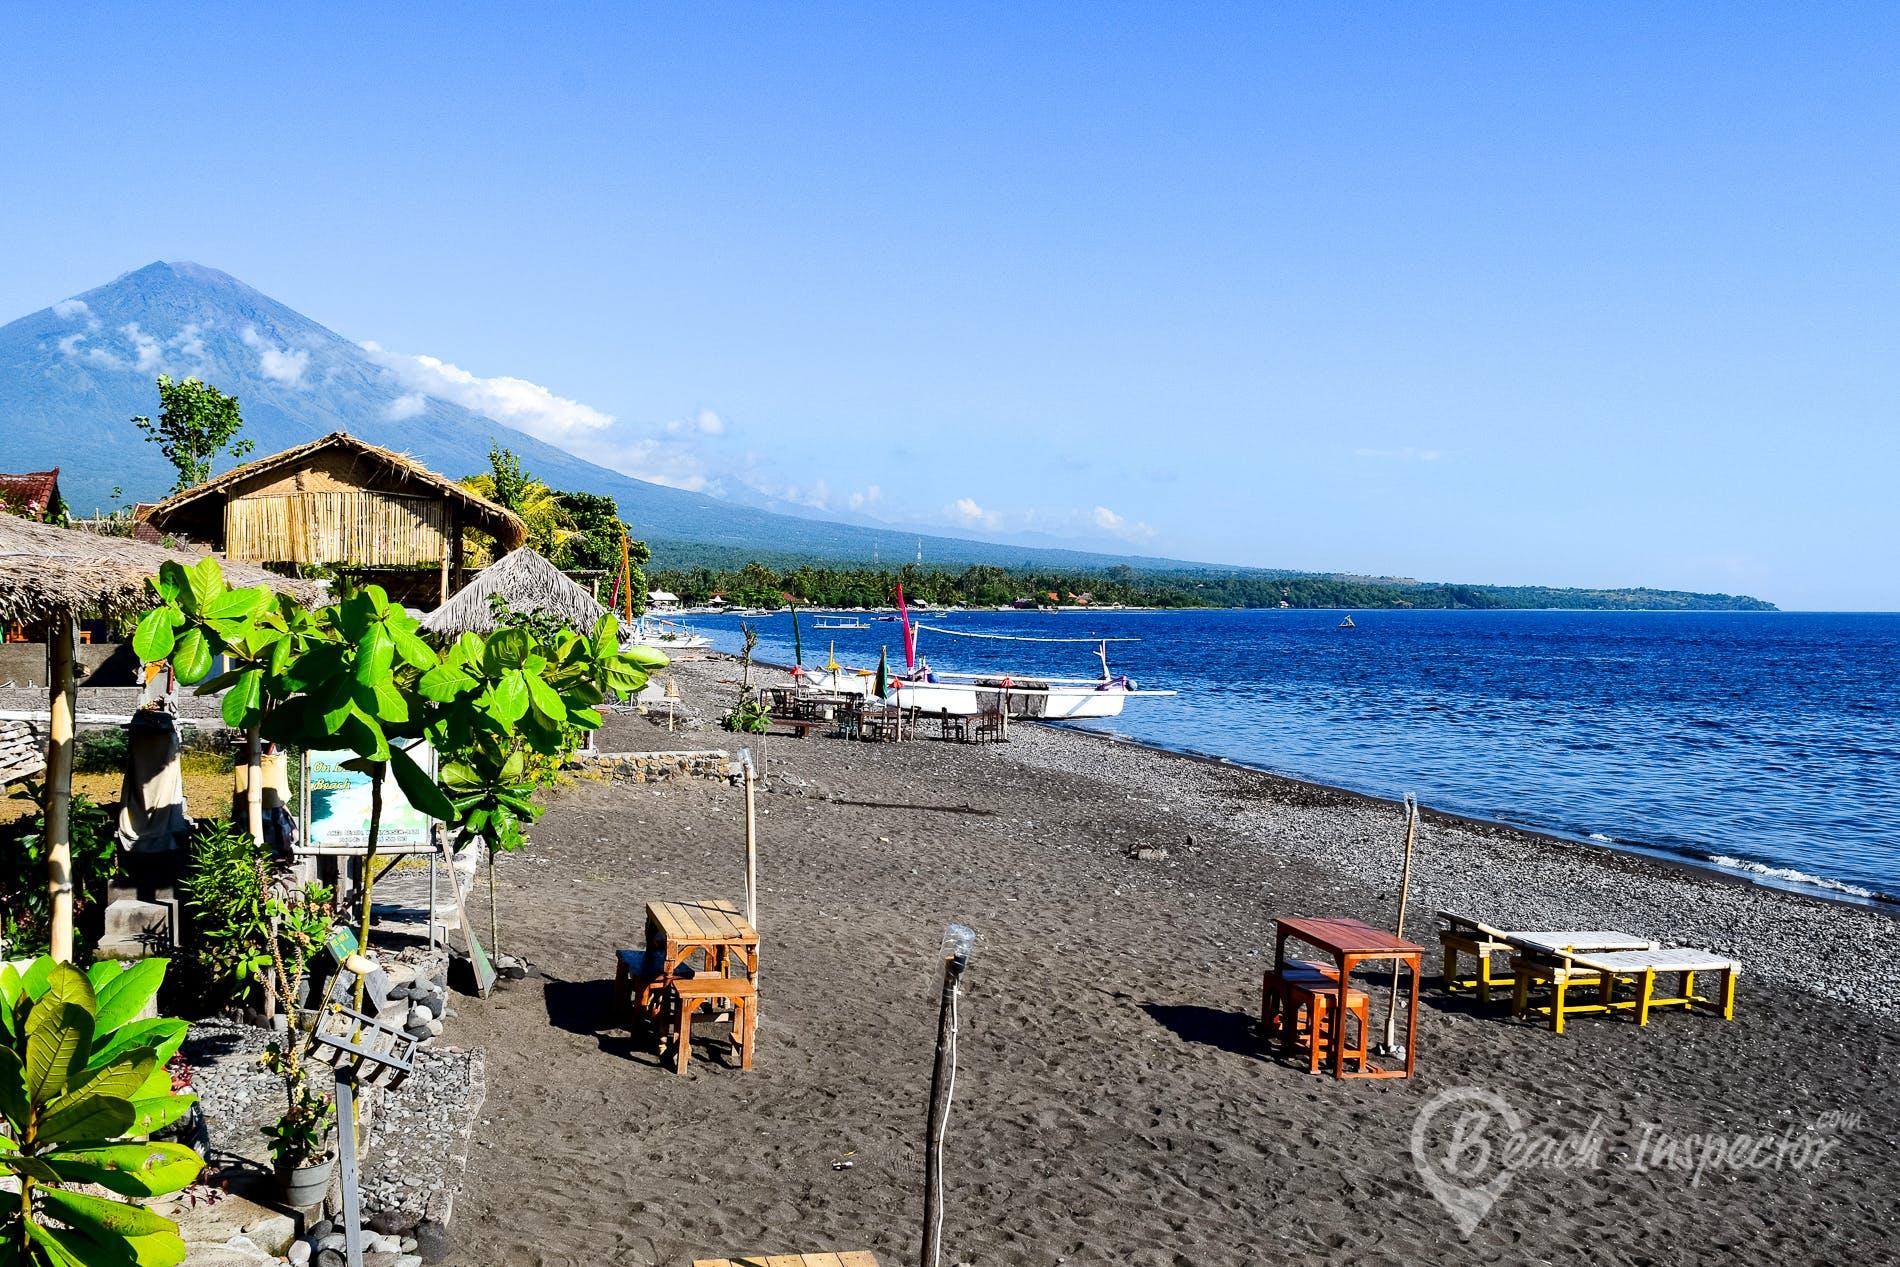 Beach Amed Beach, Bali, Indonesia